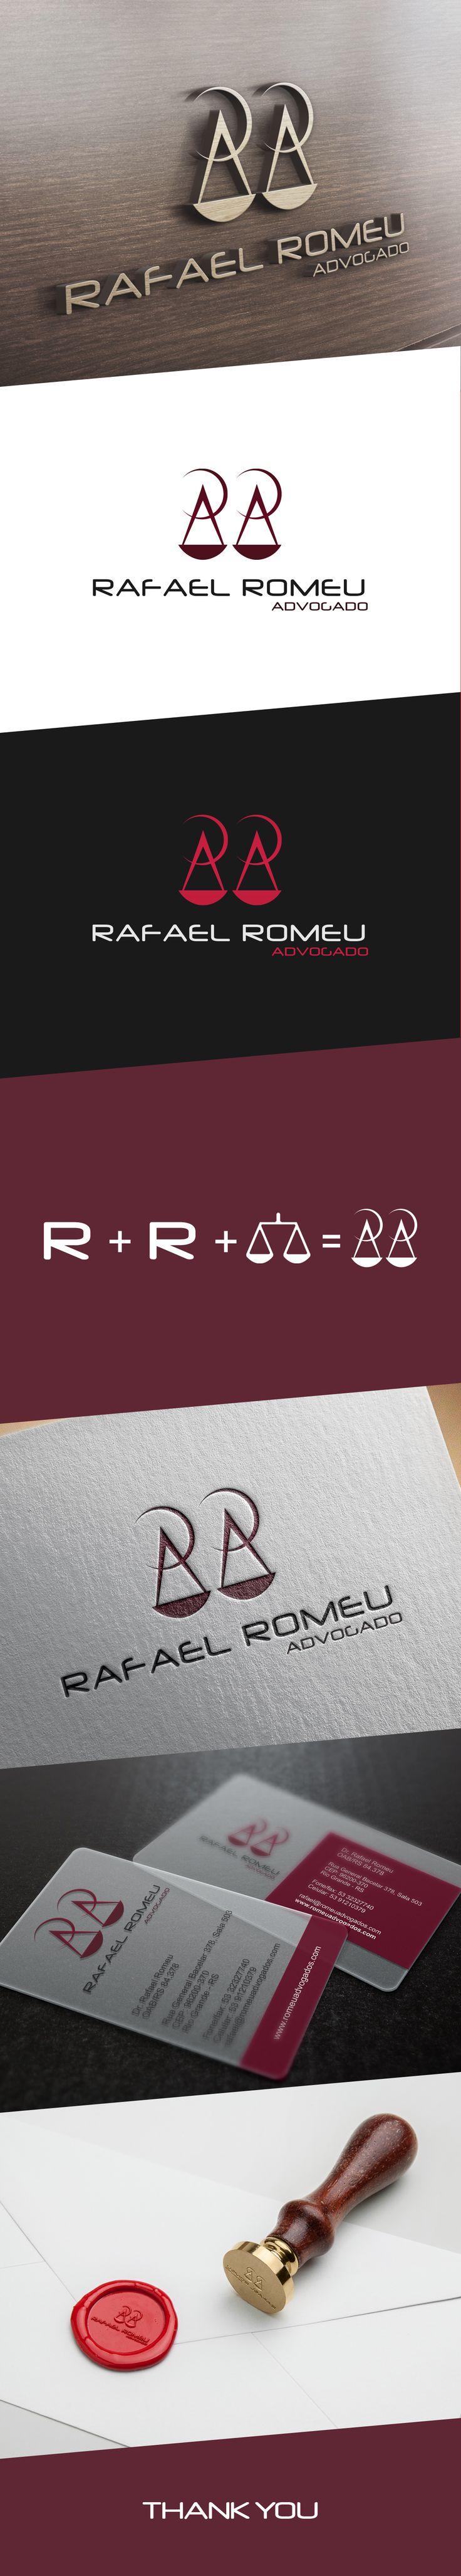 Rafael Romeu Advogado - LOGO on Behance